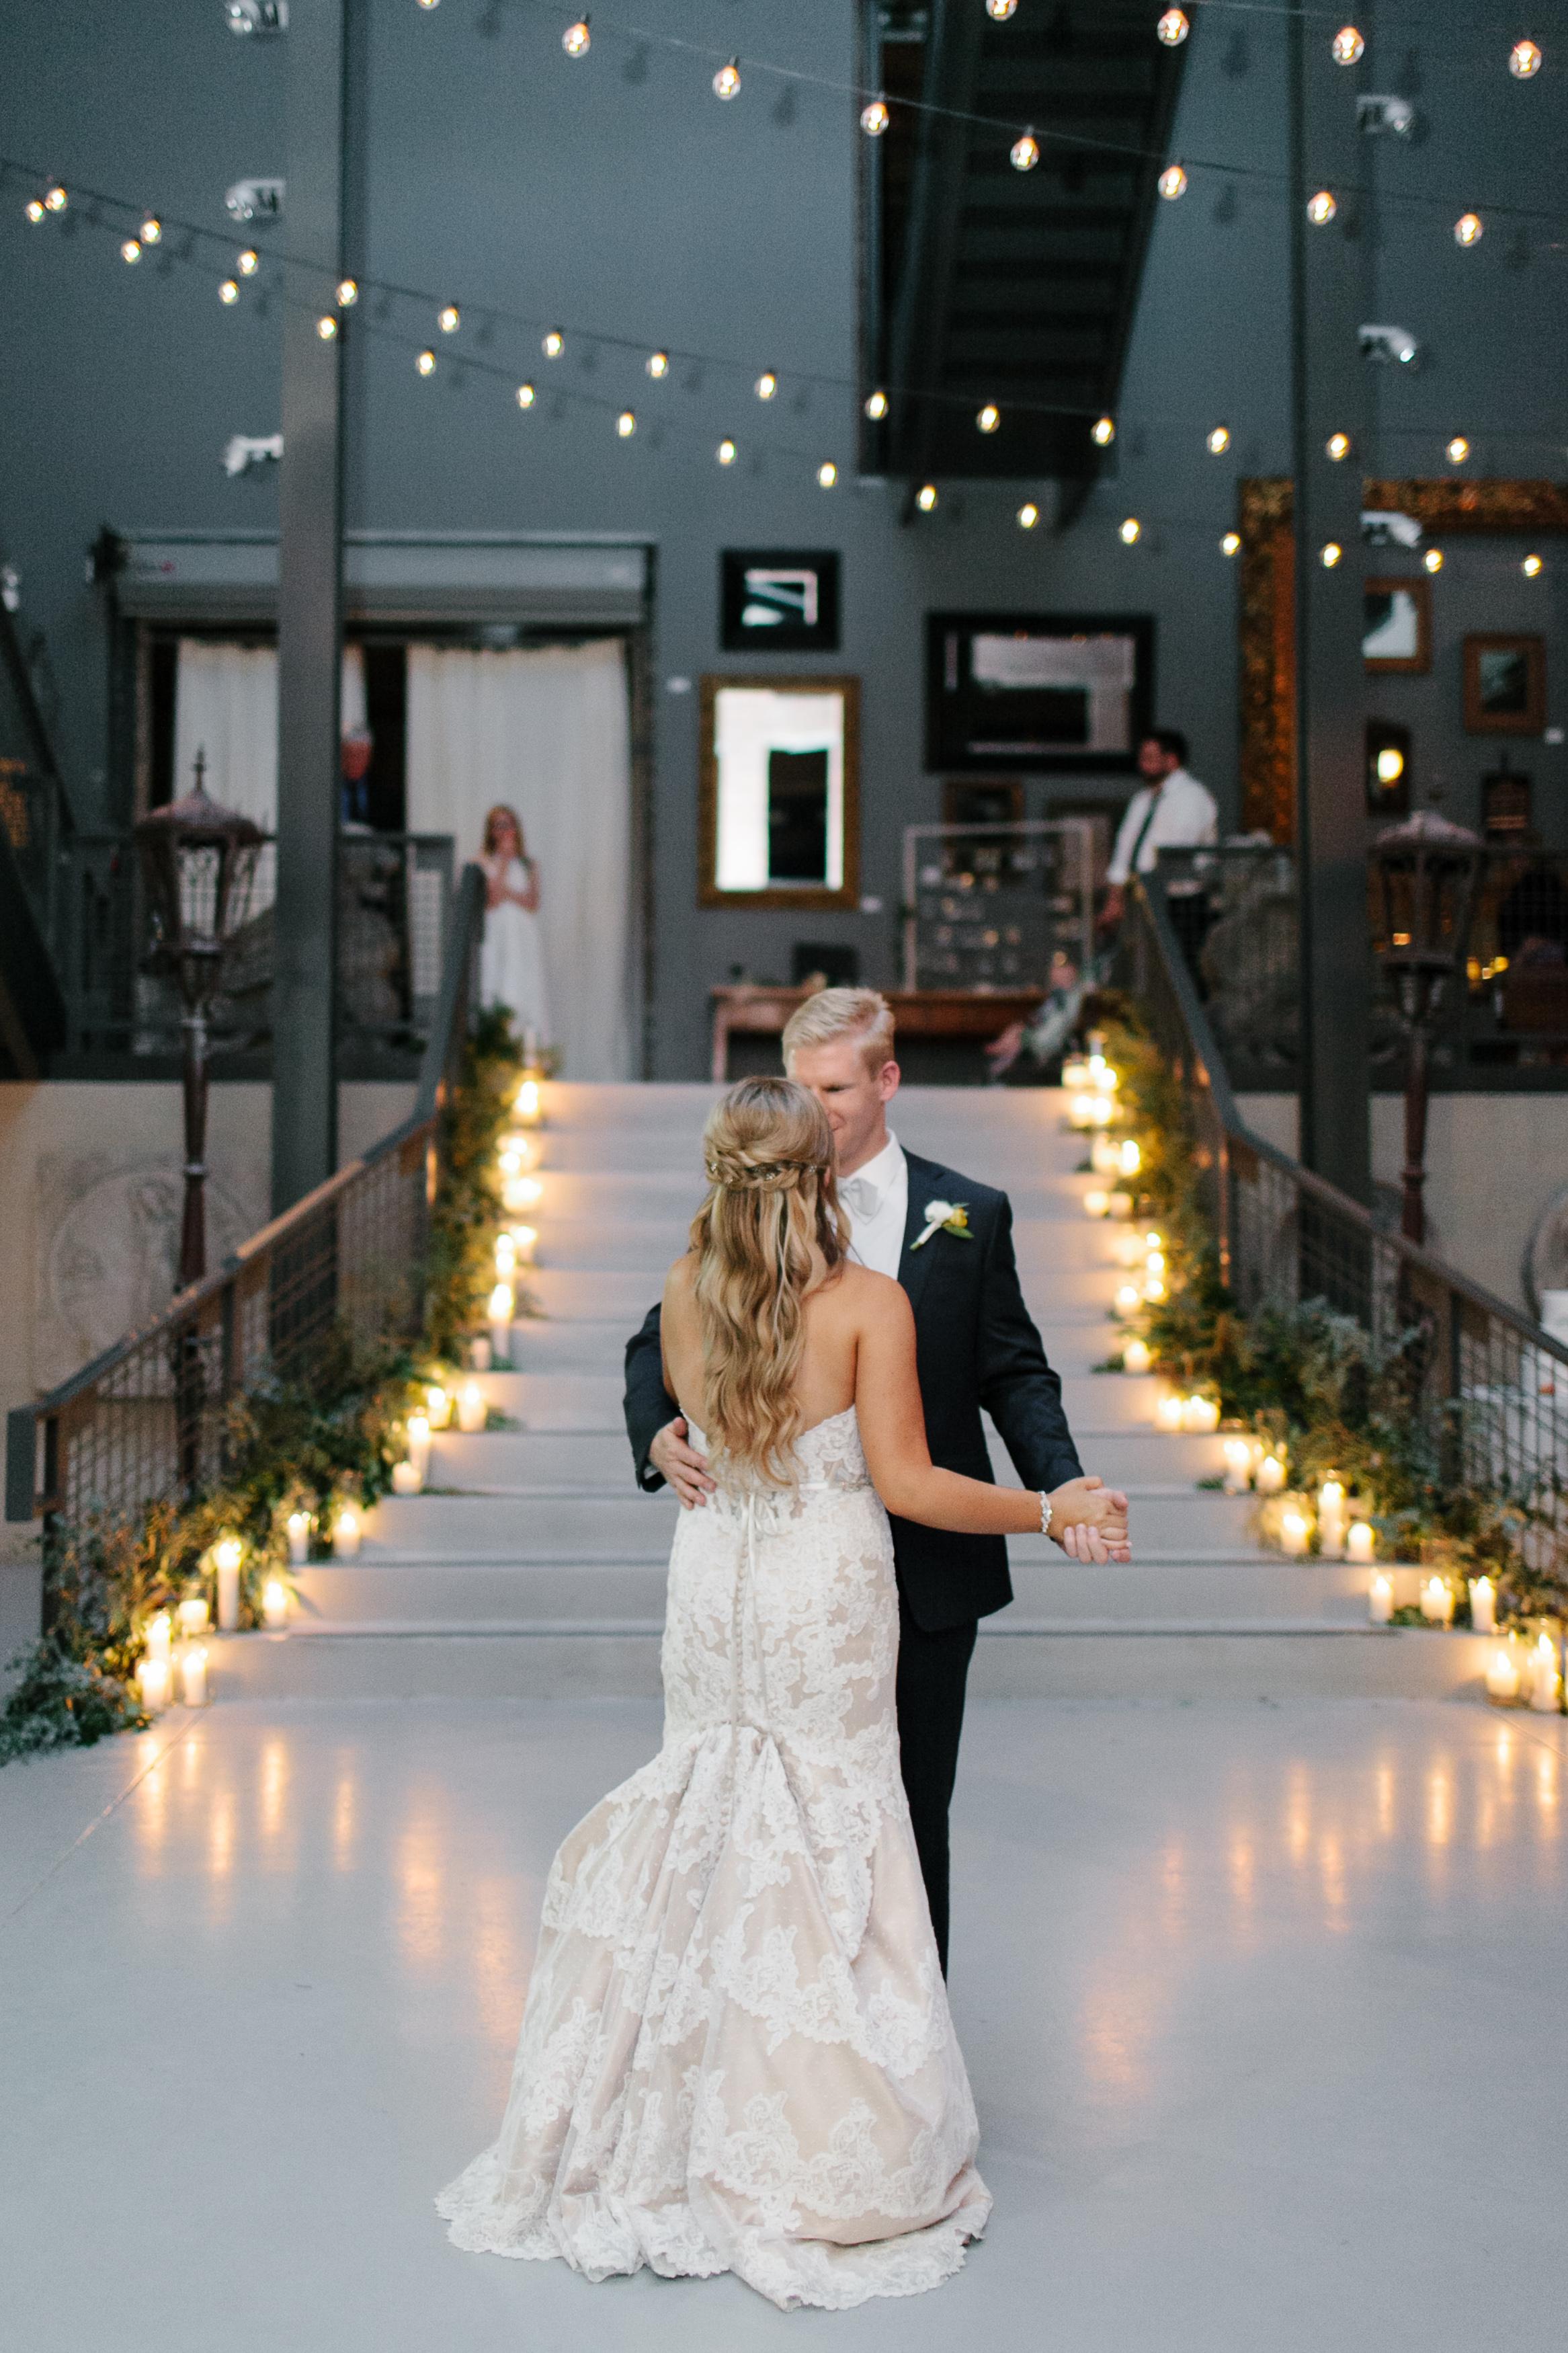 Nicodem Creative-McHugh Wedding-Artifact Events Chicago-21.jpg